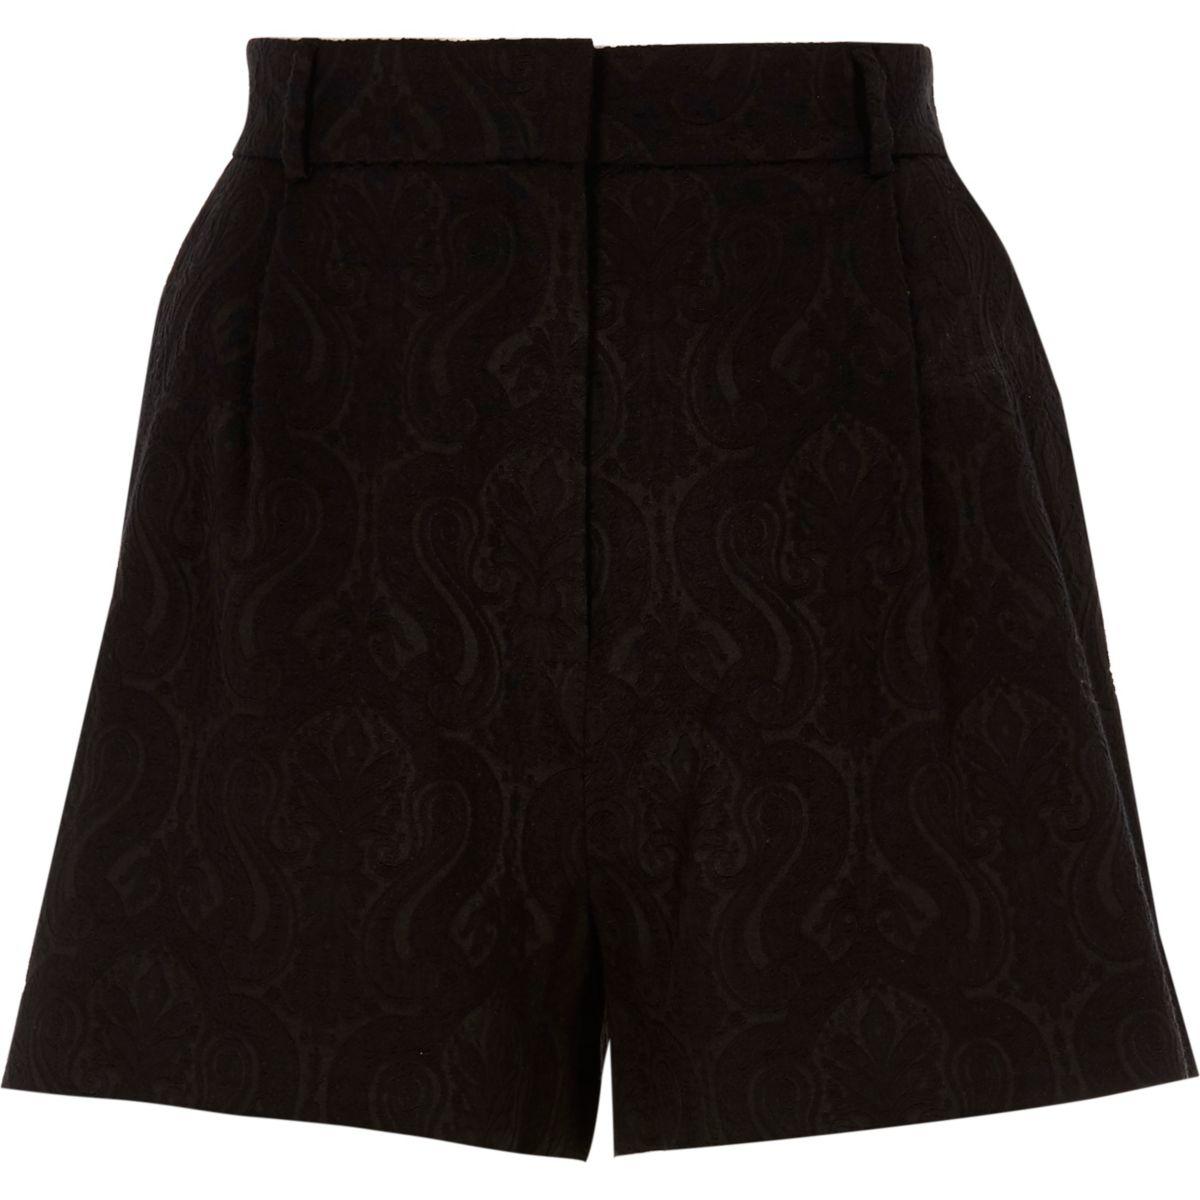 Schwarze Jacquard-Shorts